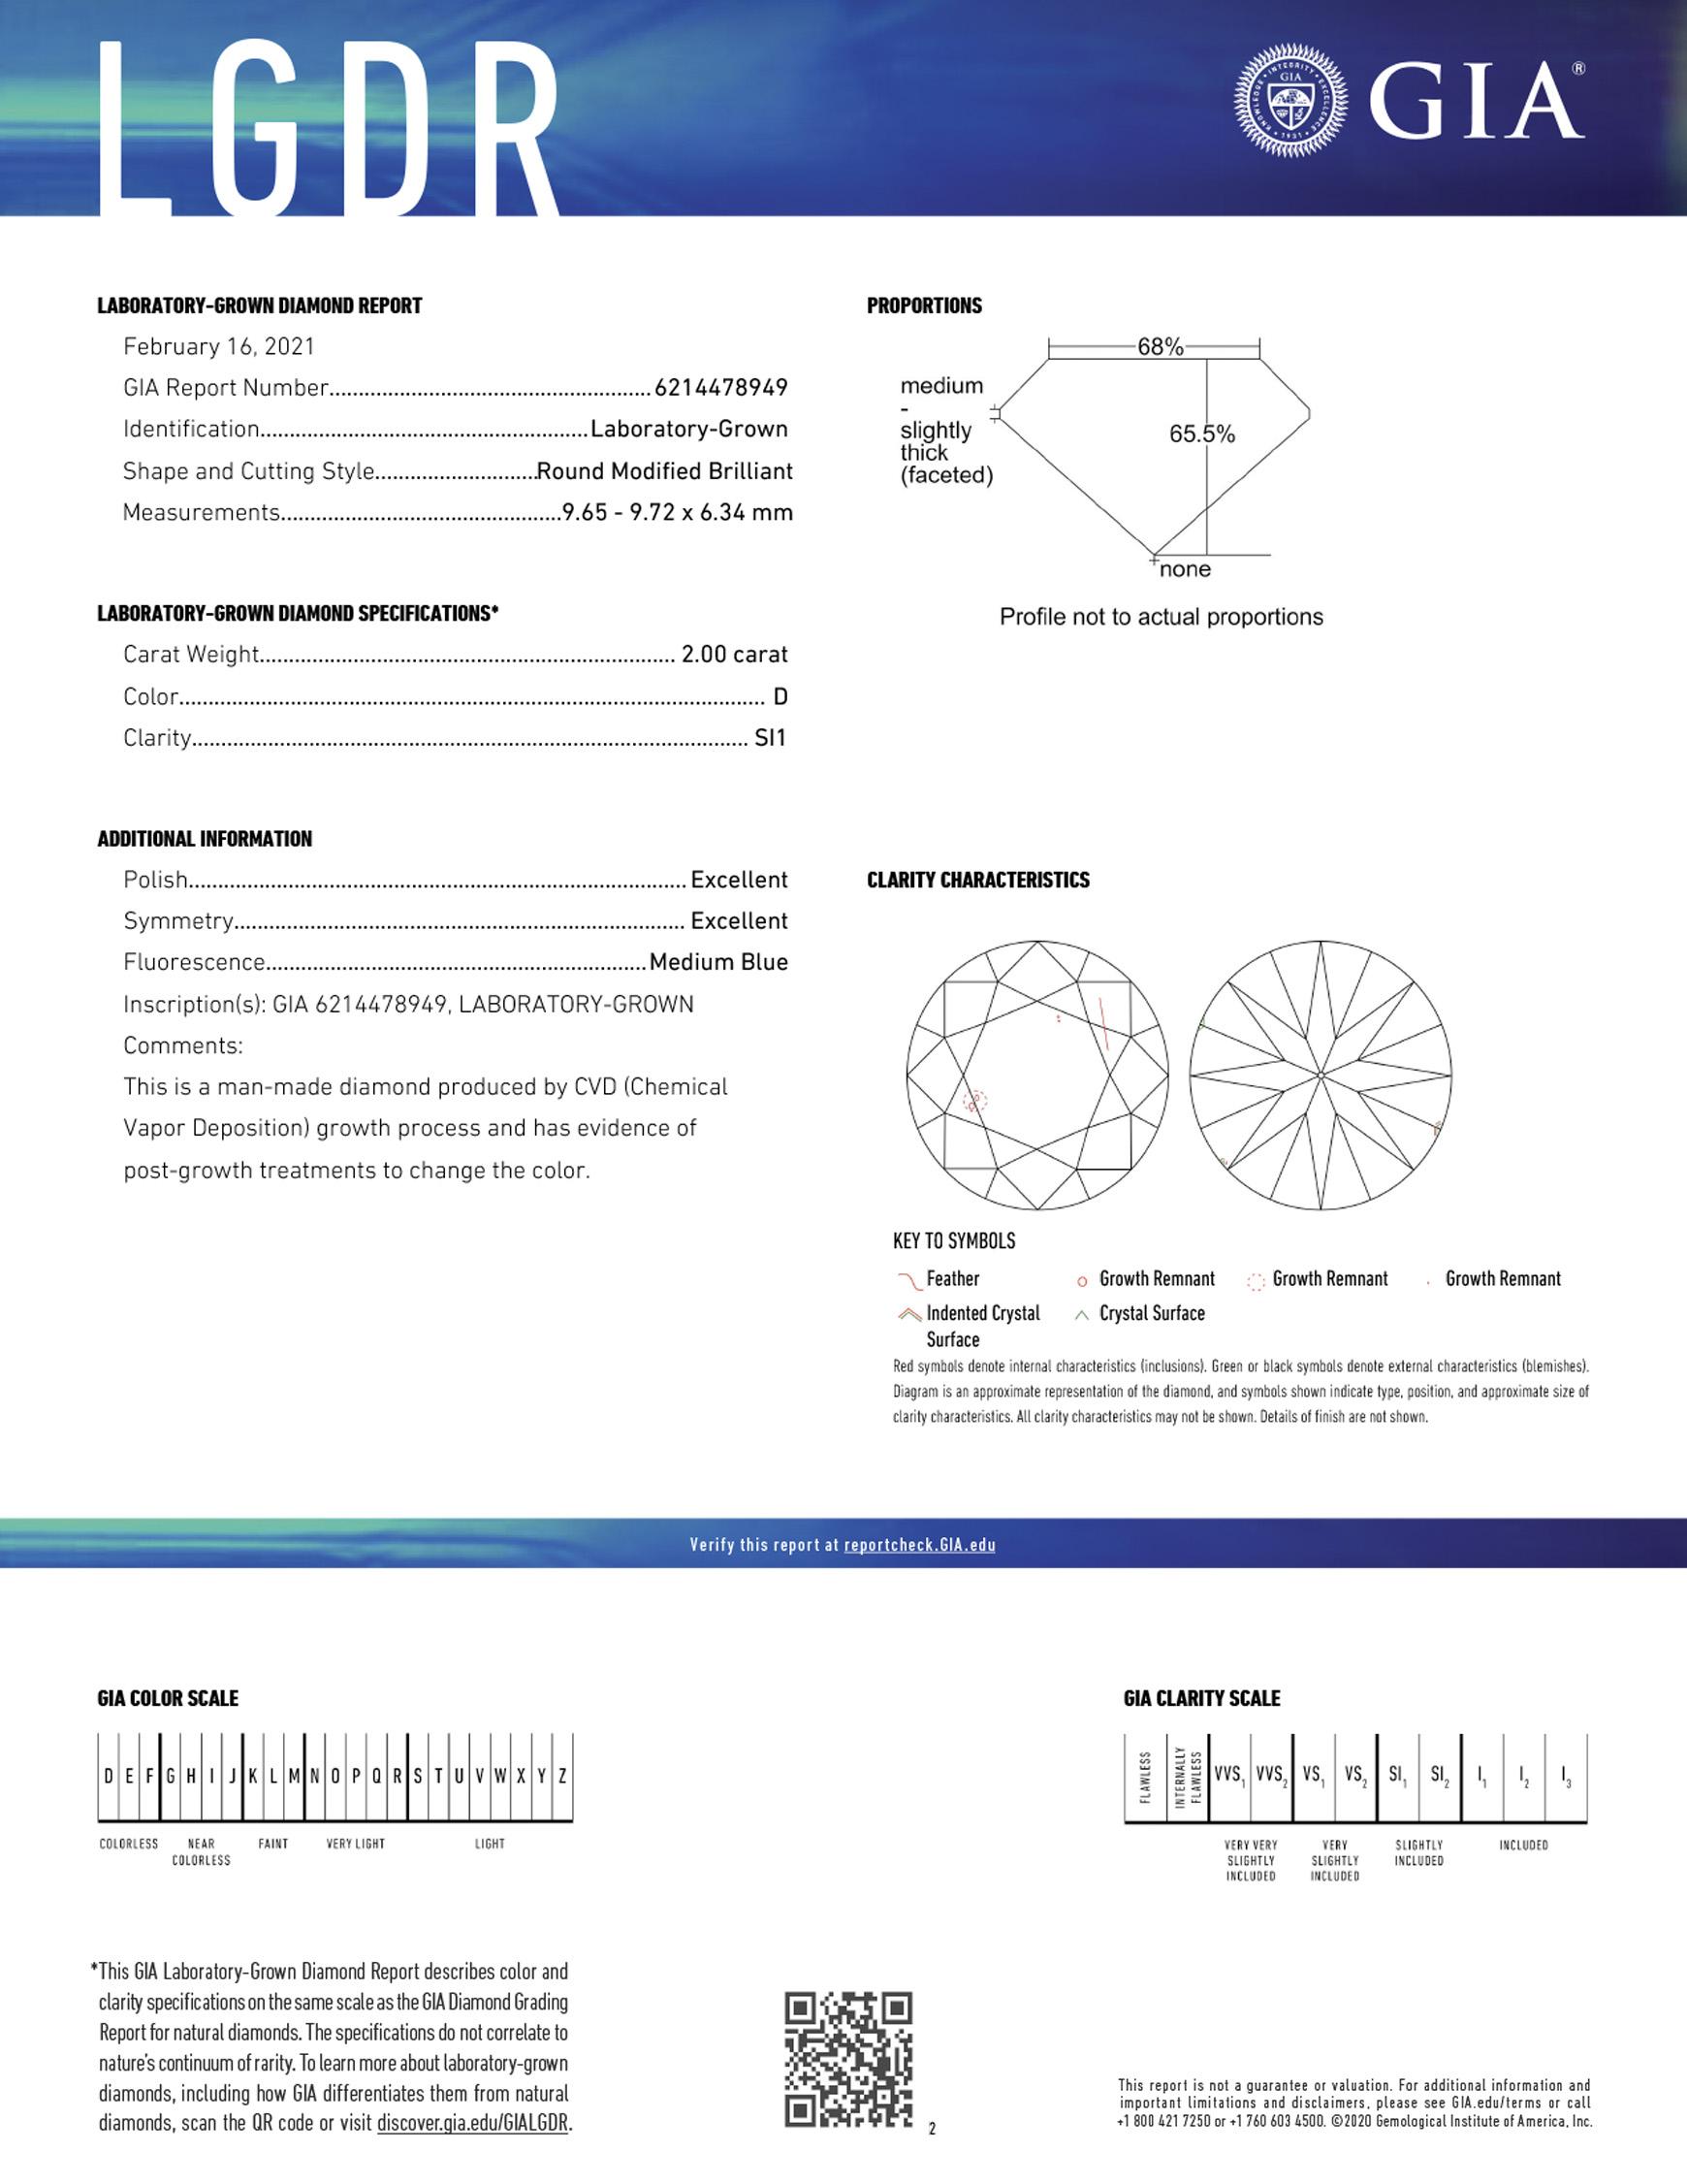 Sample Laboratory-Grown Diamond Report